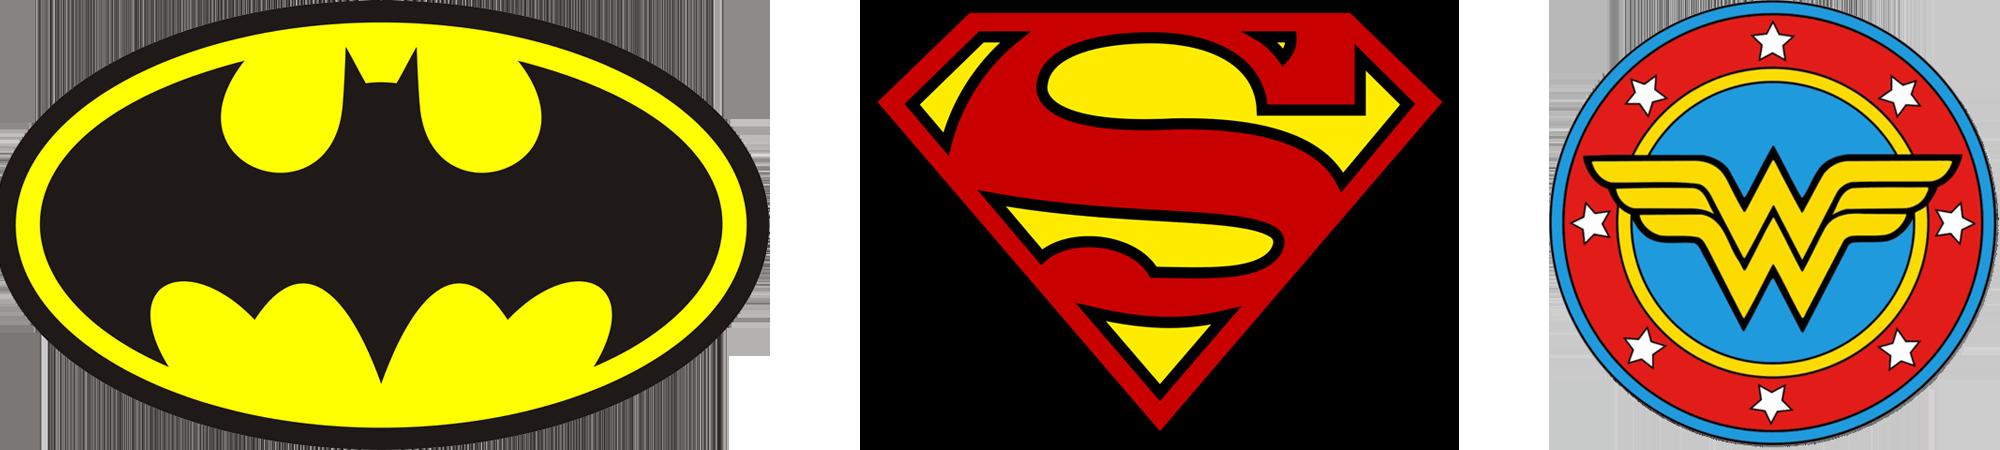 Superhero logos that implement yellow